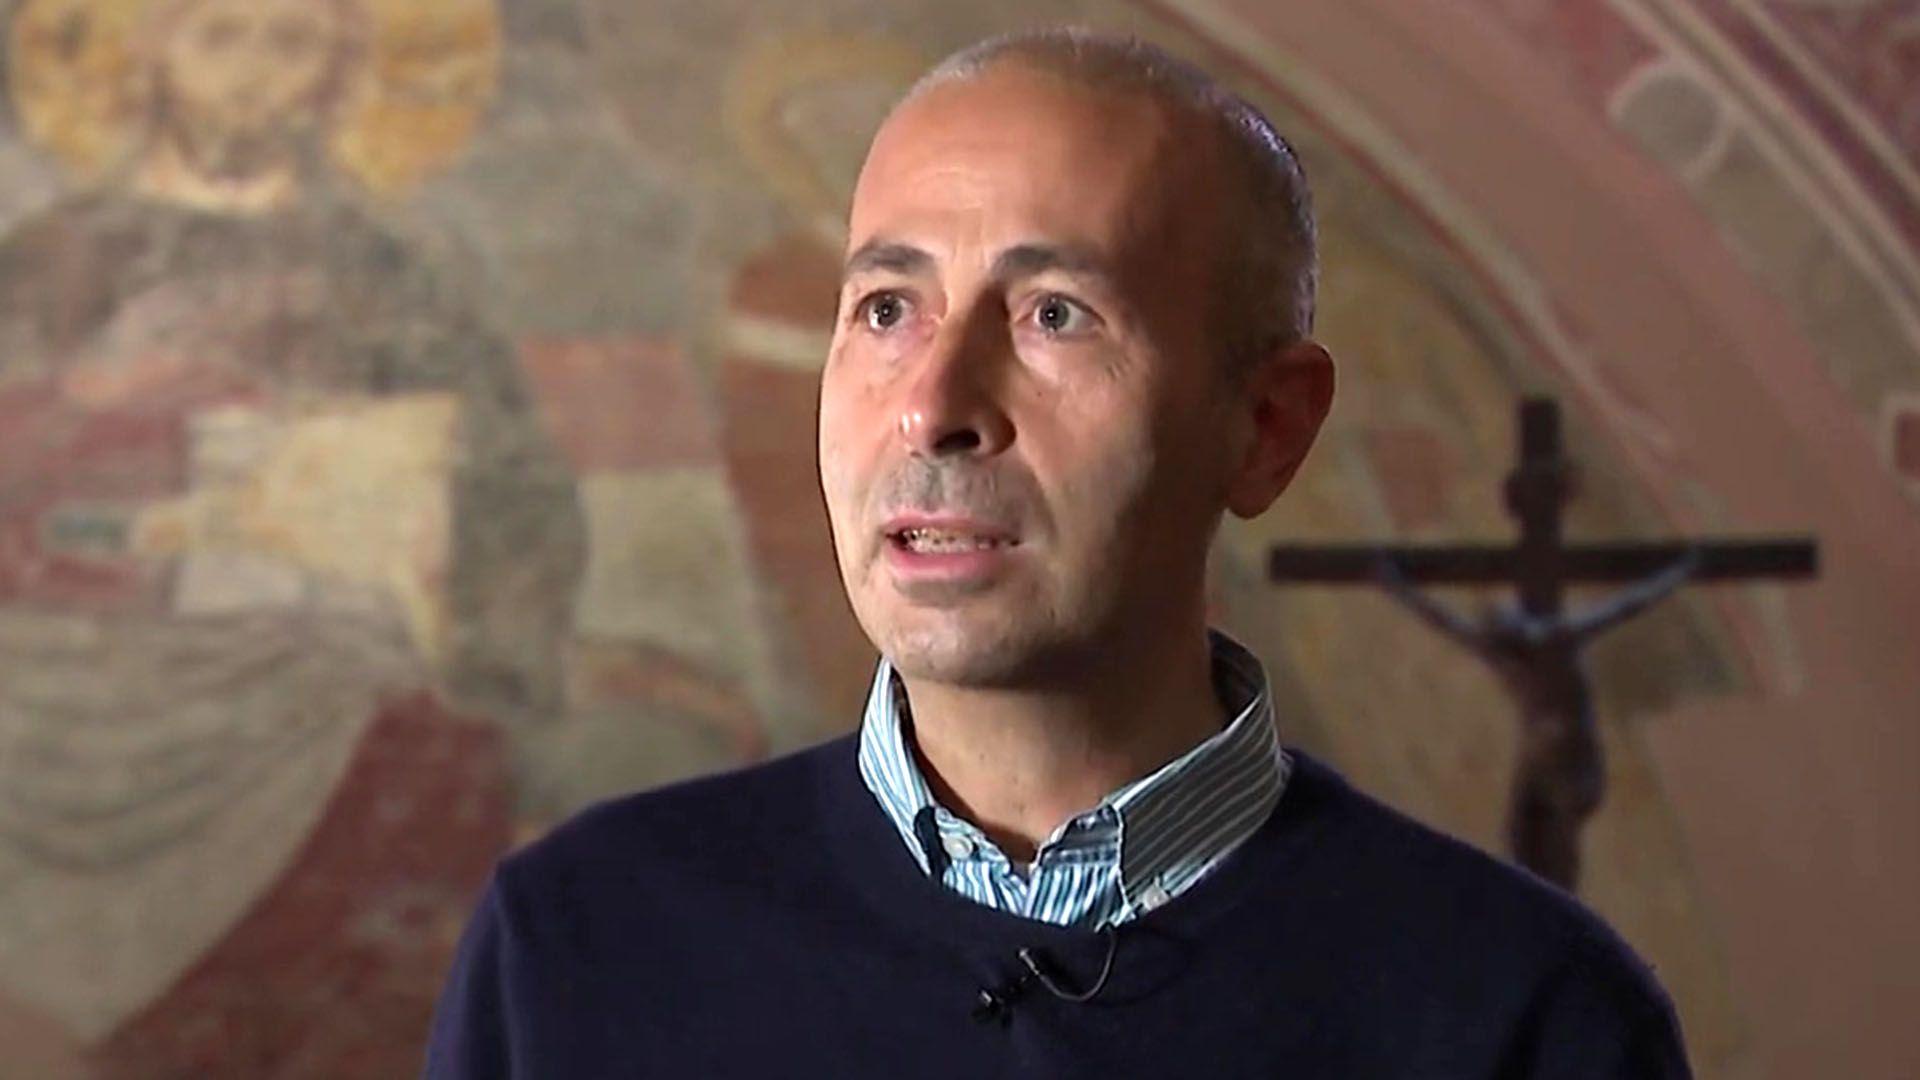 Nicola Gori Postulador de Carlo Acutis